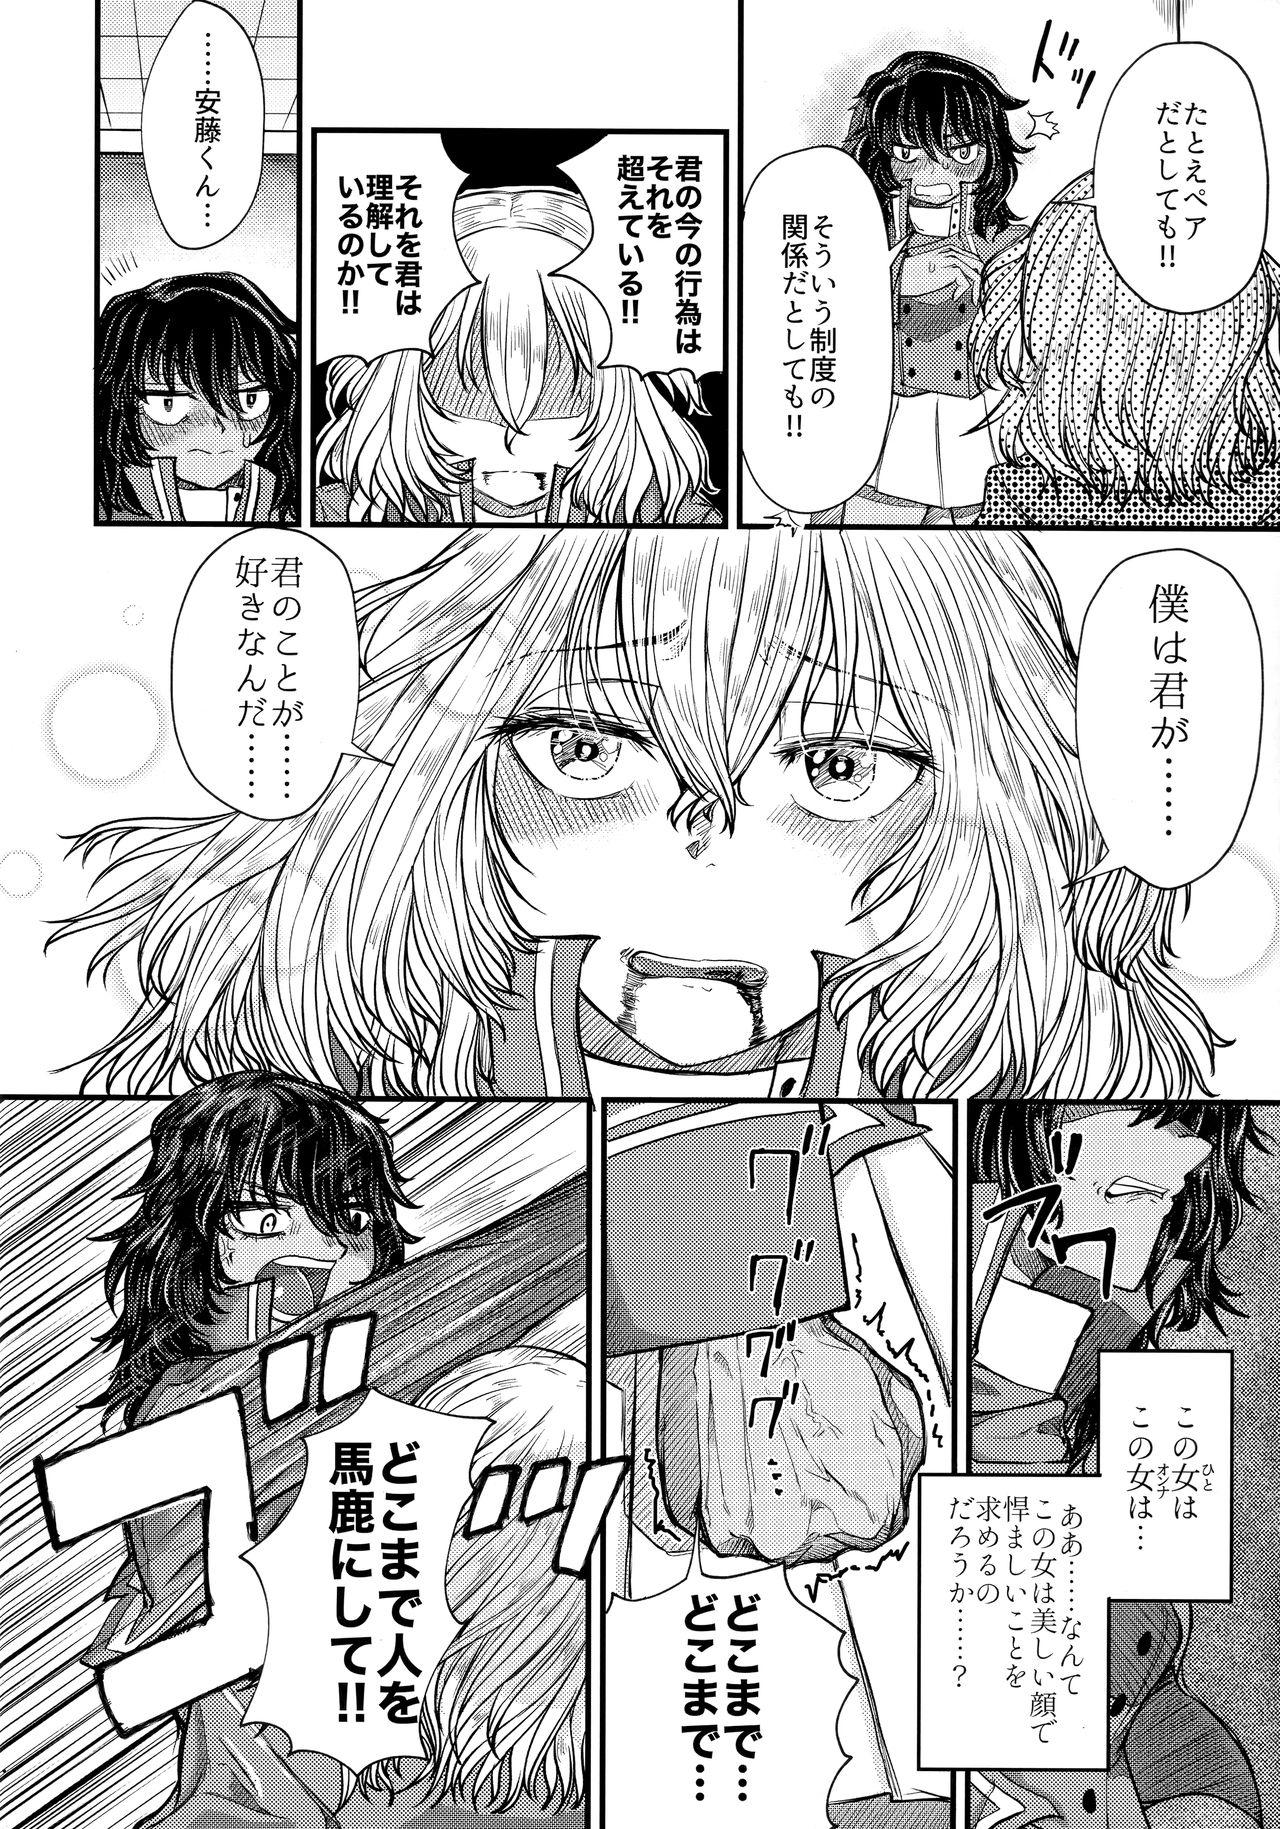 Kimi o Aishitai. 12